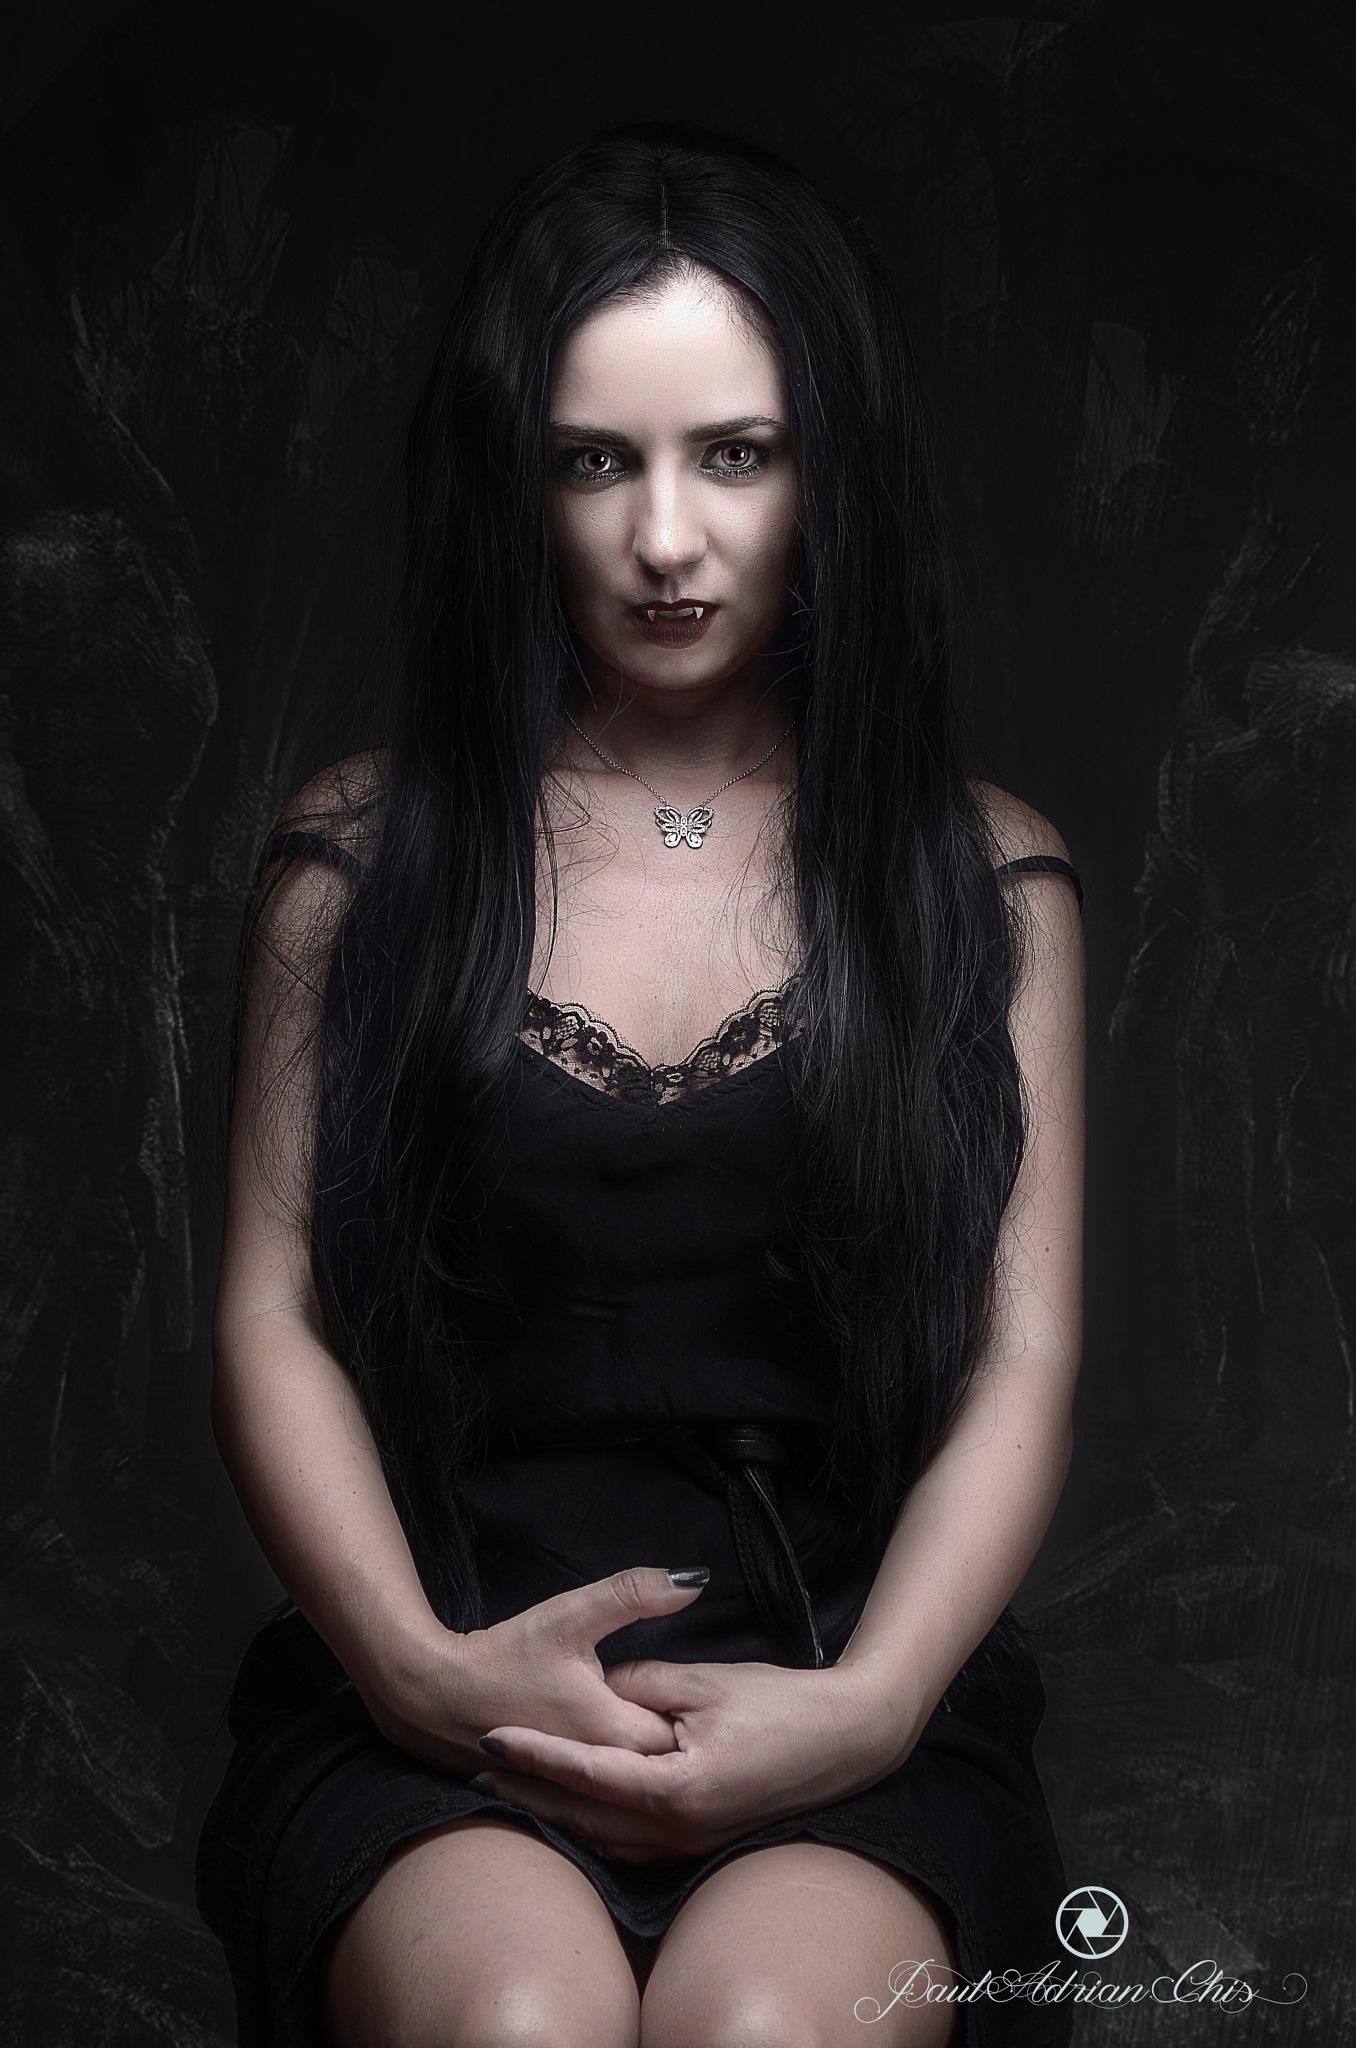 MINA the Vampire  by Paul Adrian Chis